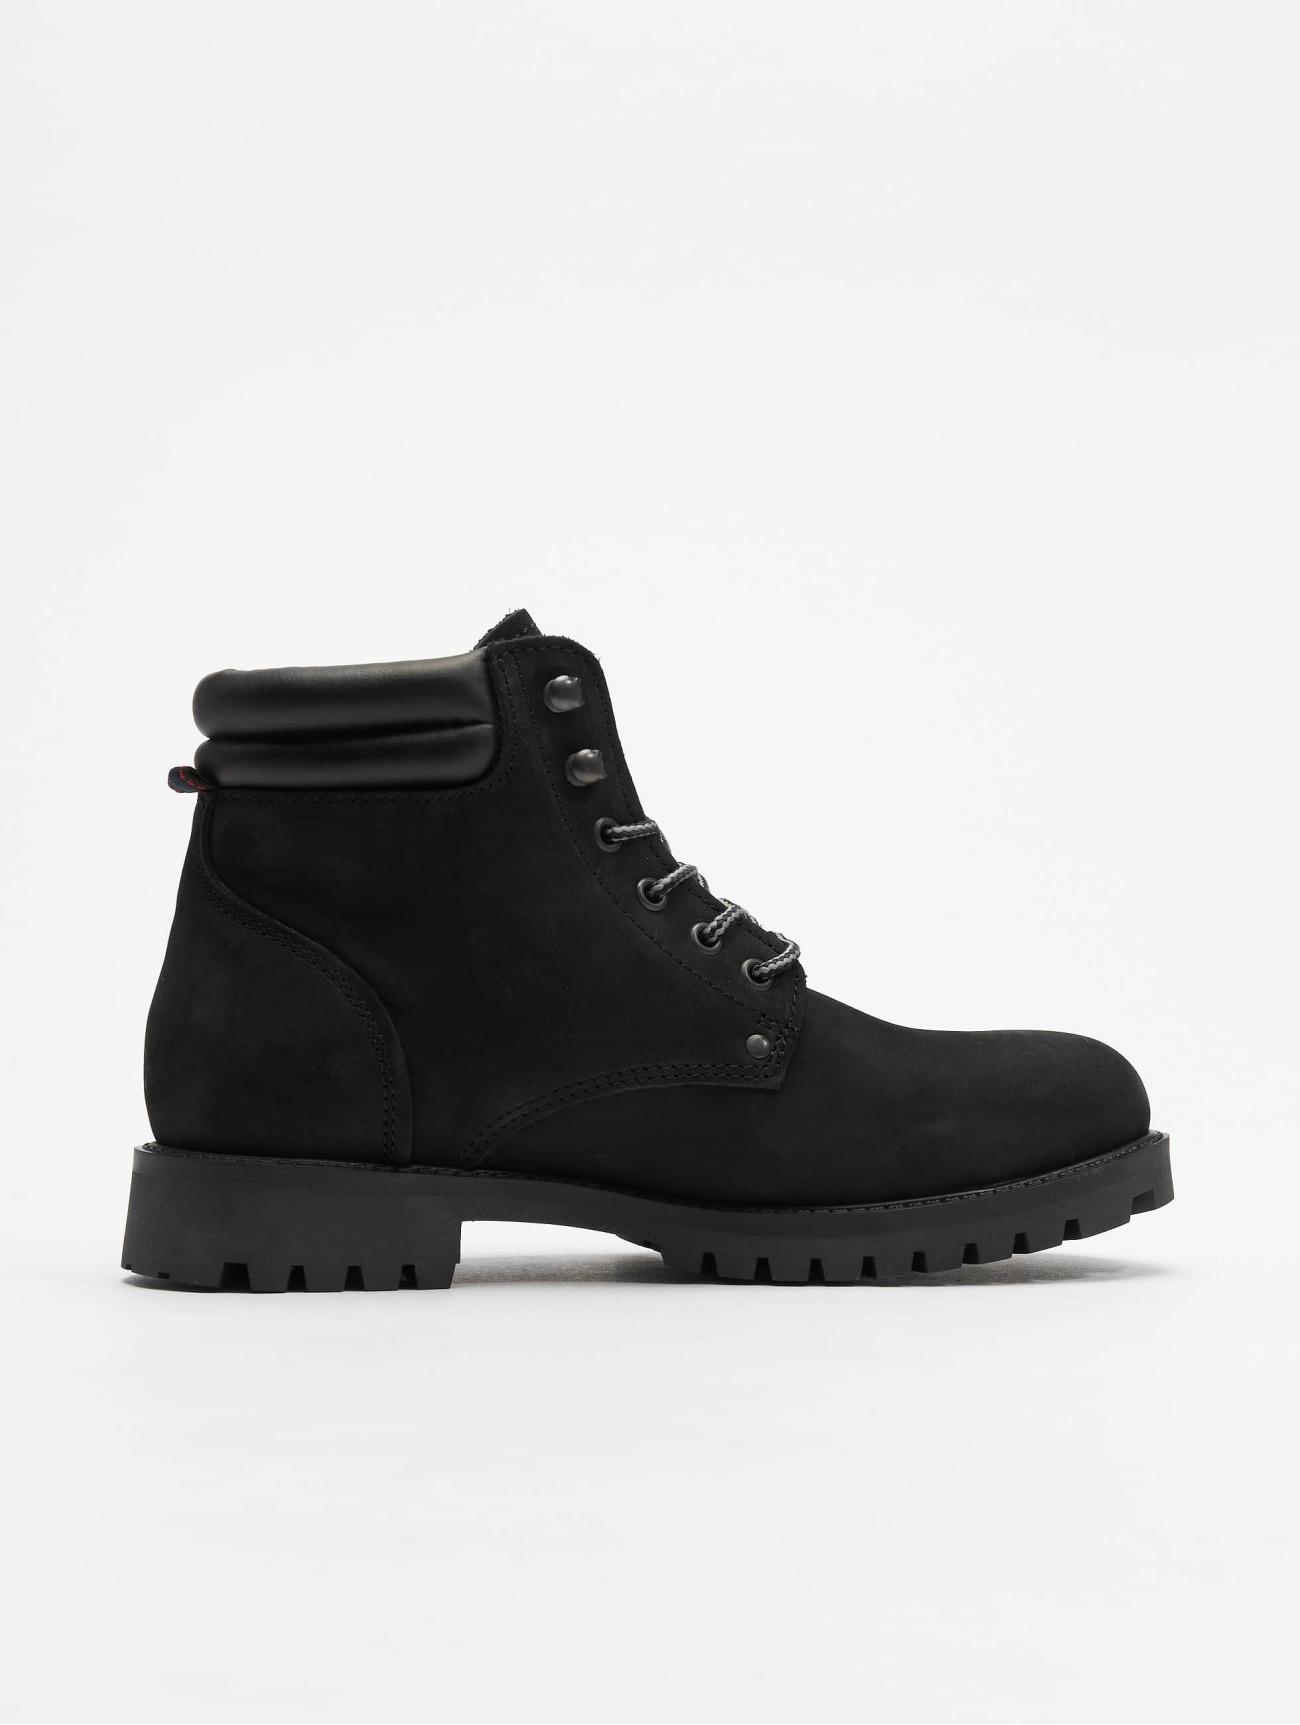 Jack \u0026 Jones | j fwStoke noir Homme Chaussures montantes 532559